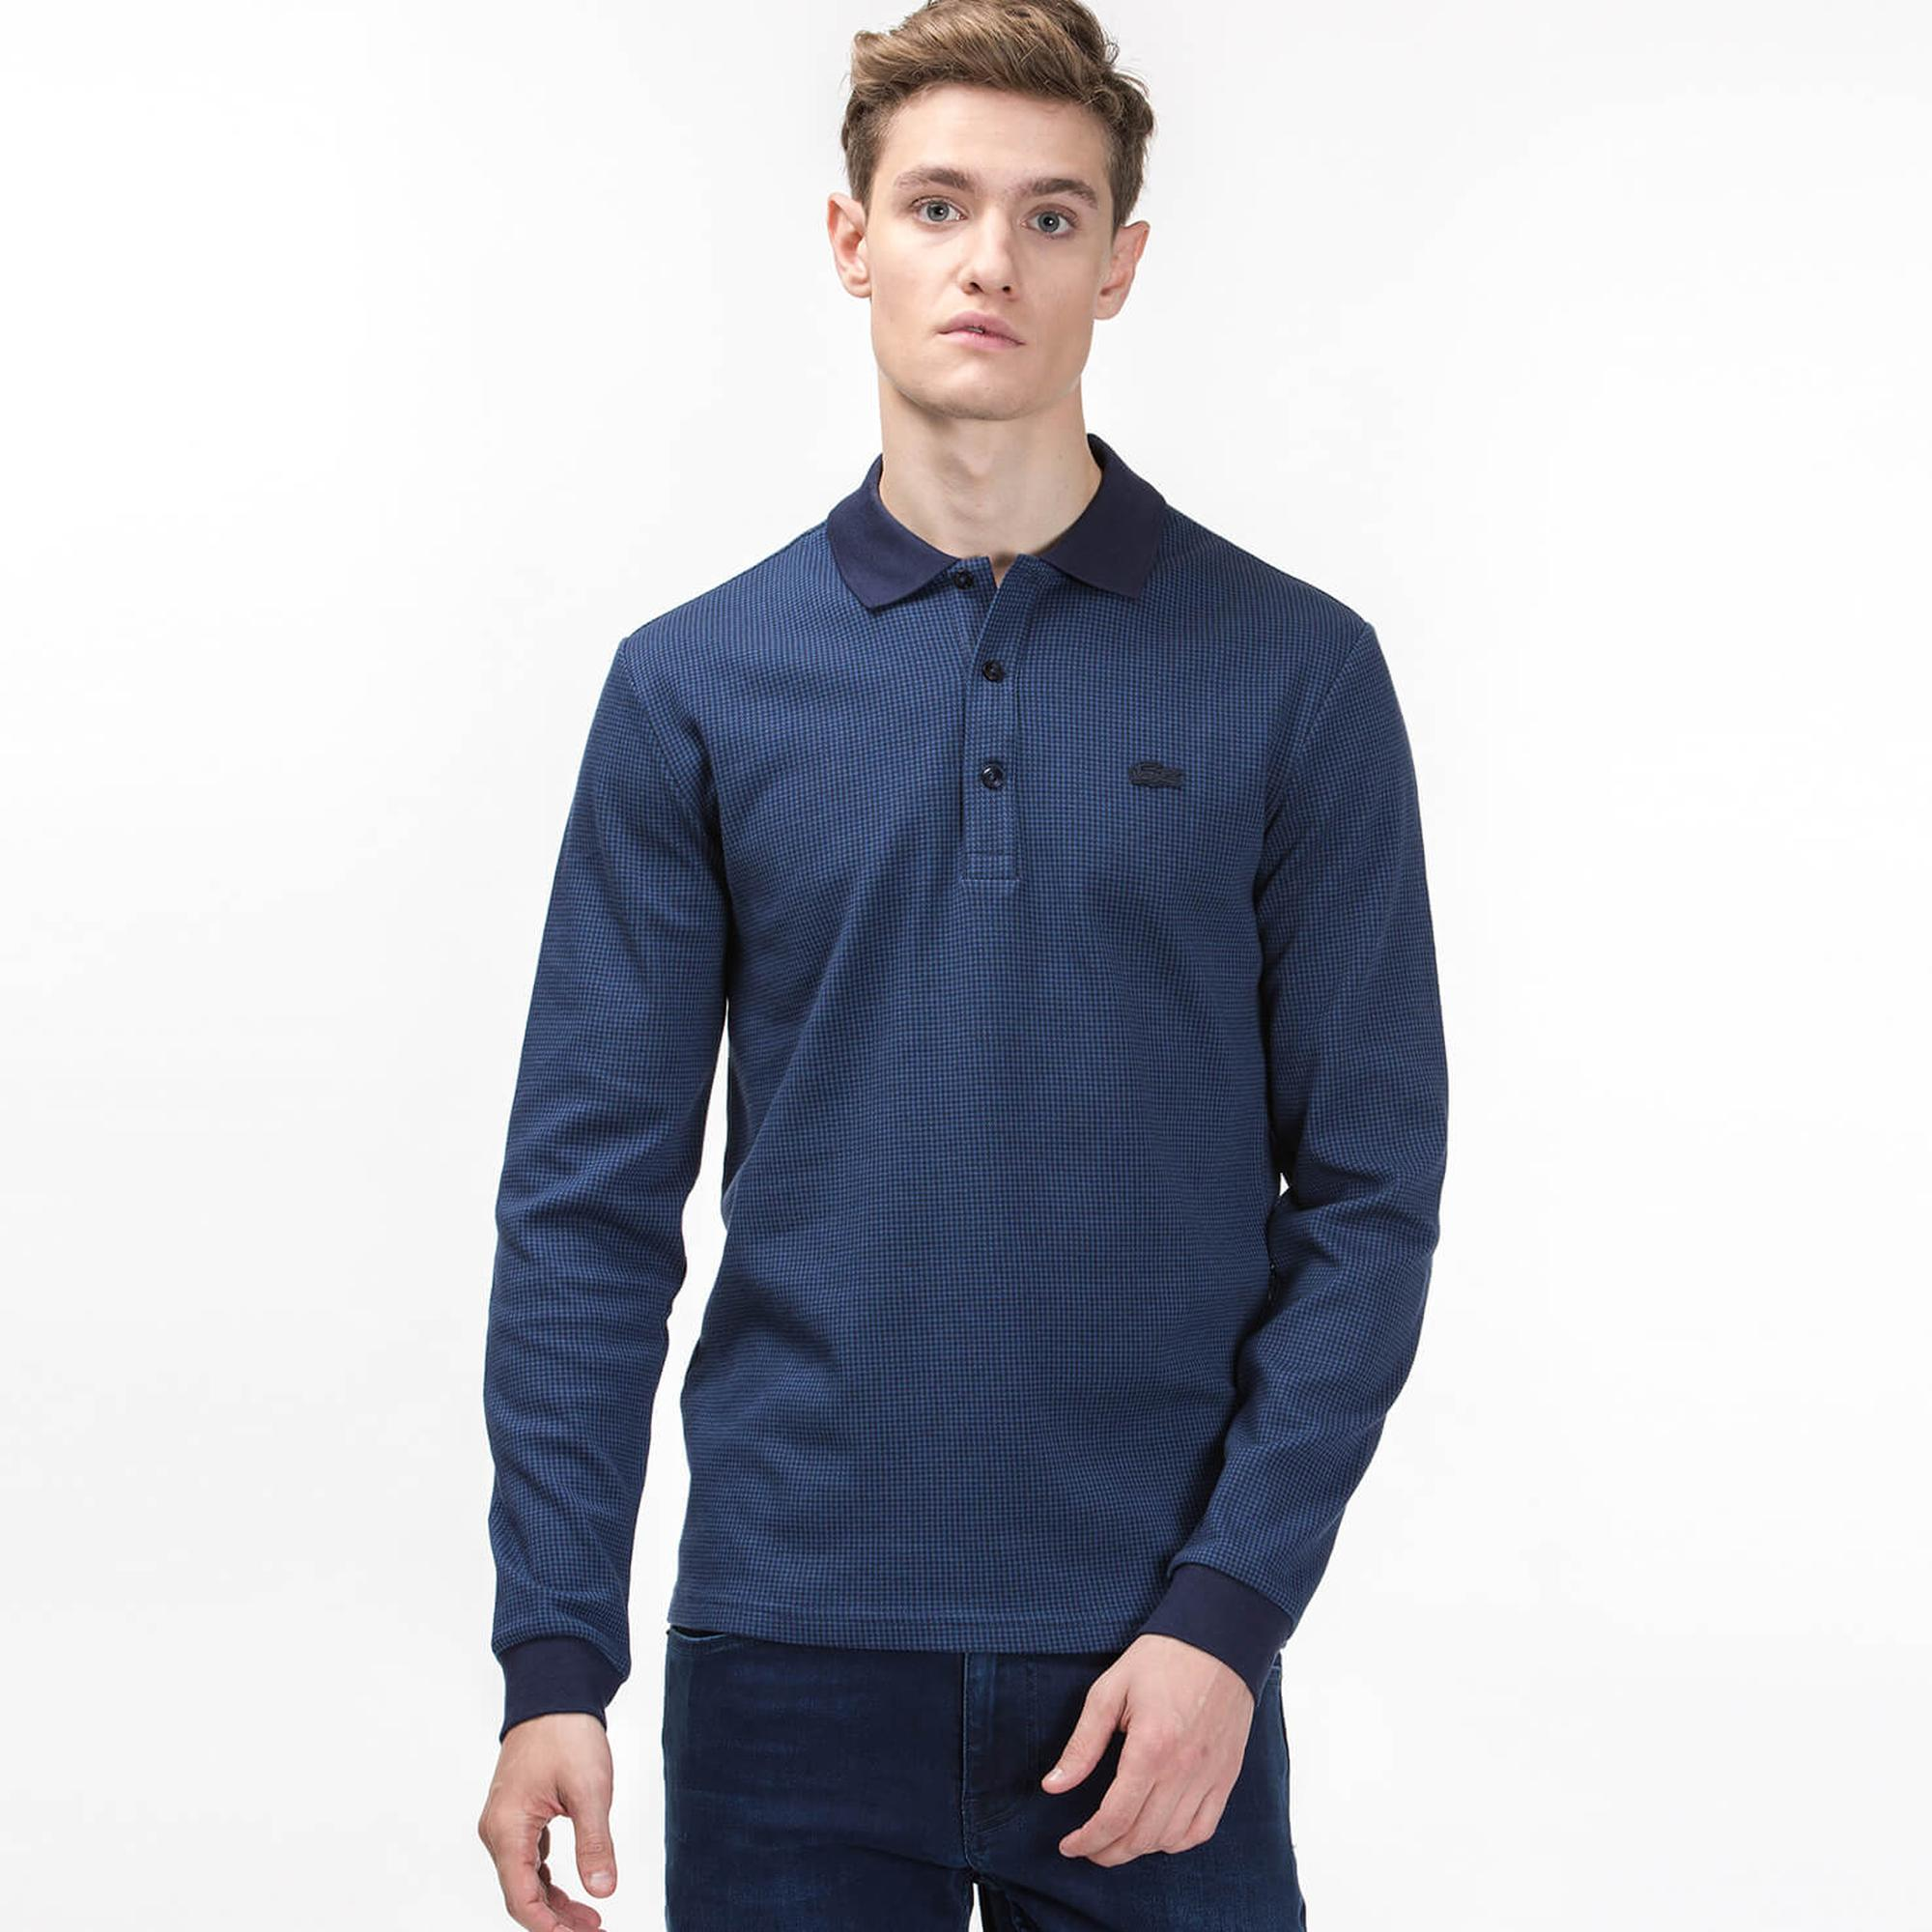 Lacoste Men's Long Sleeve Slim Fit Polo